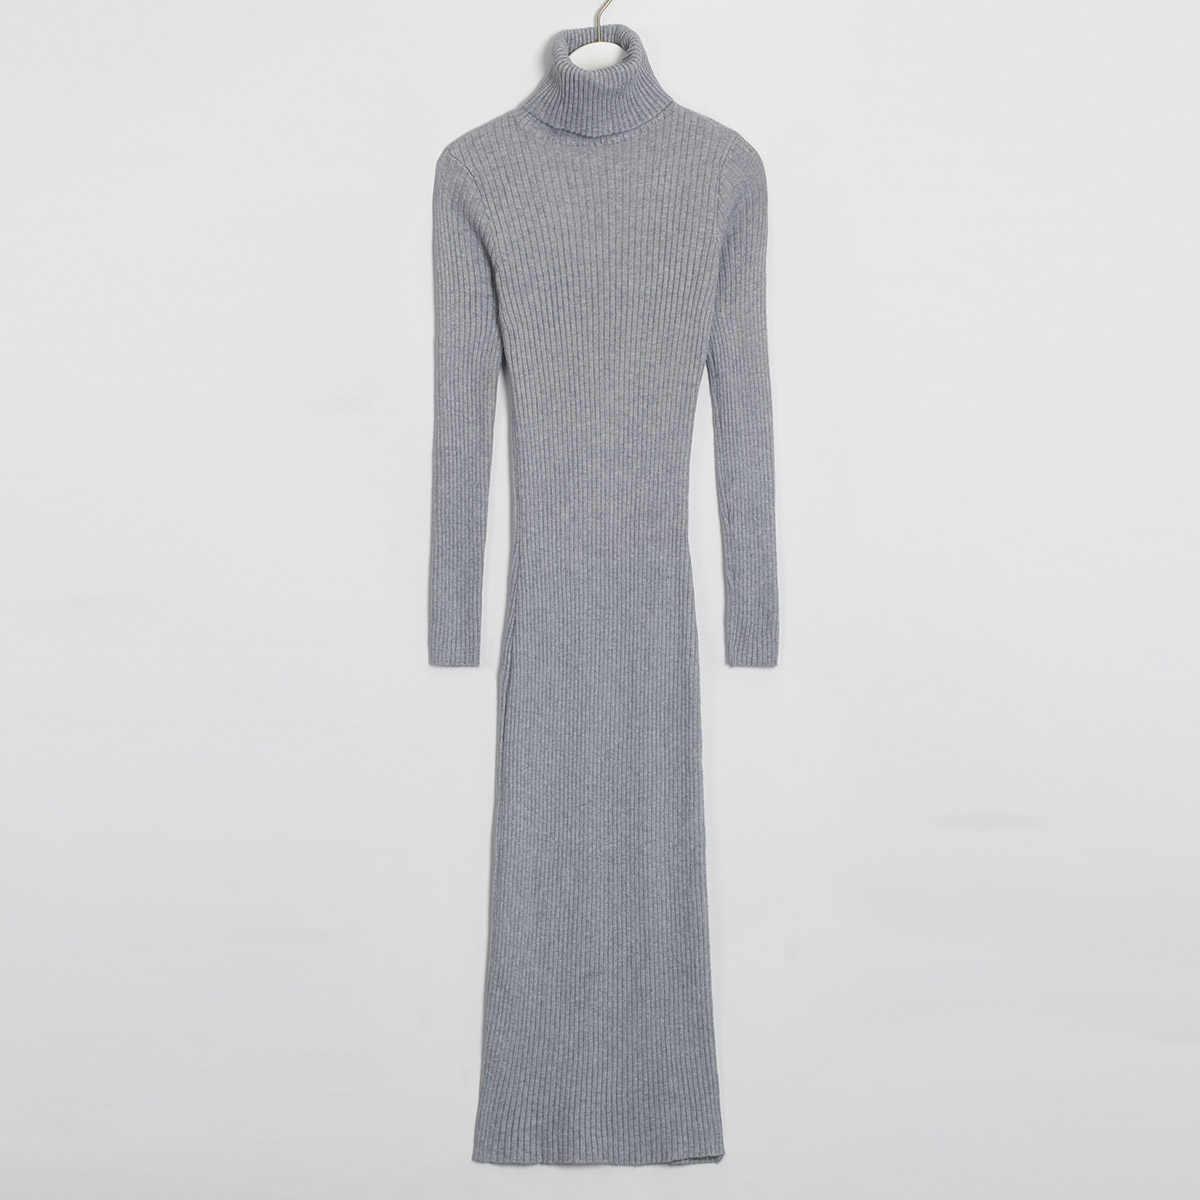 Wixra ニットボディコンドレス 2019 秋冬ソリッドタートルネック長袖膝丈のセータードレス